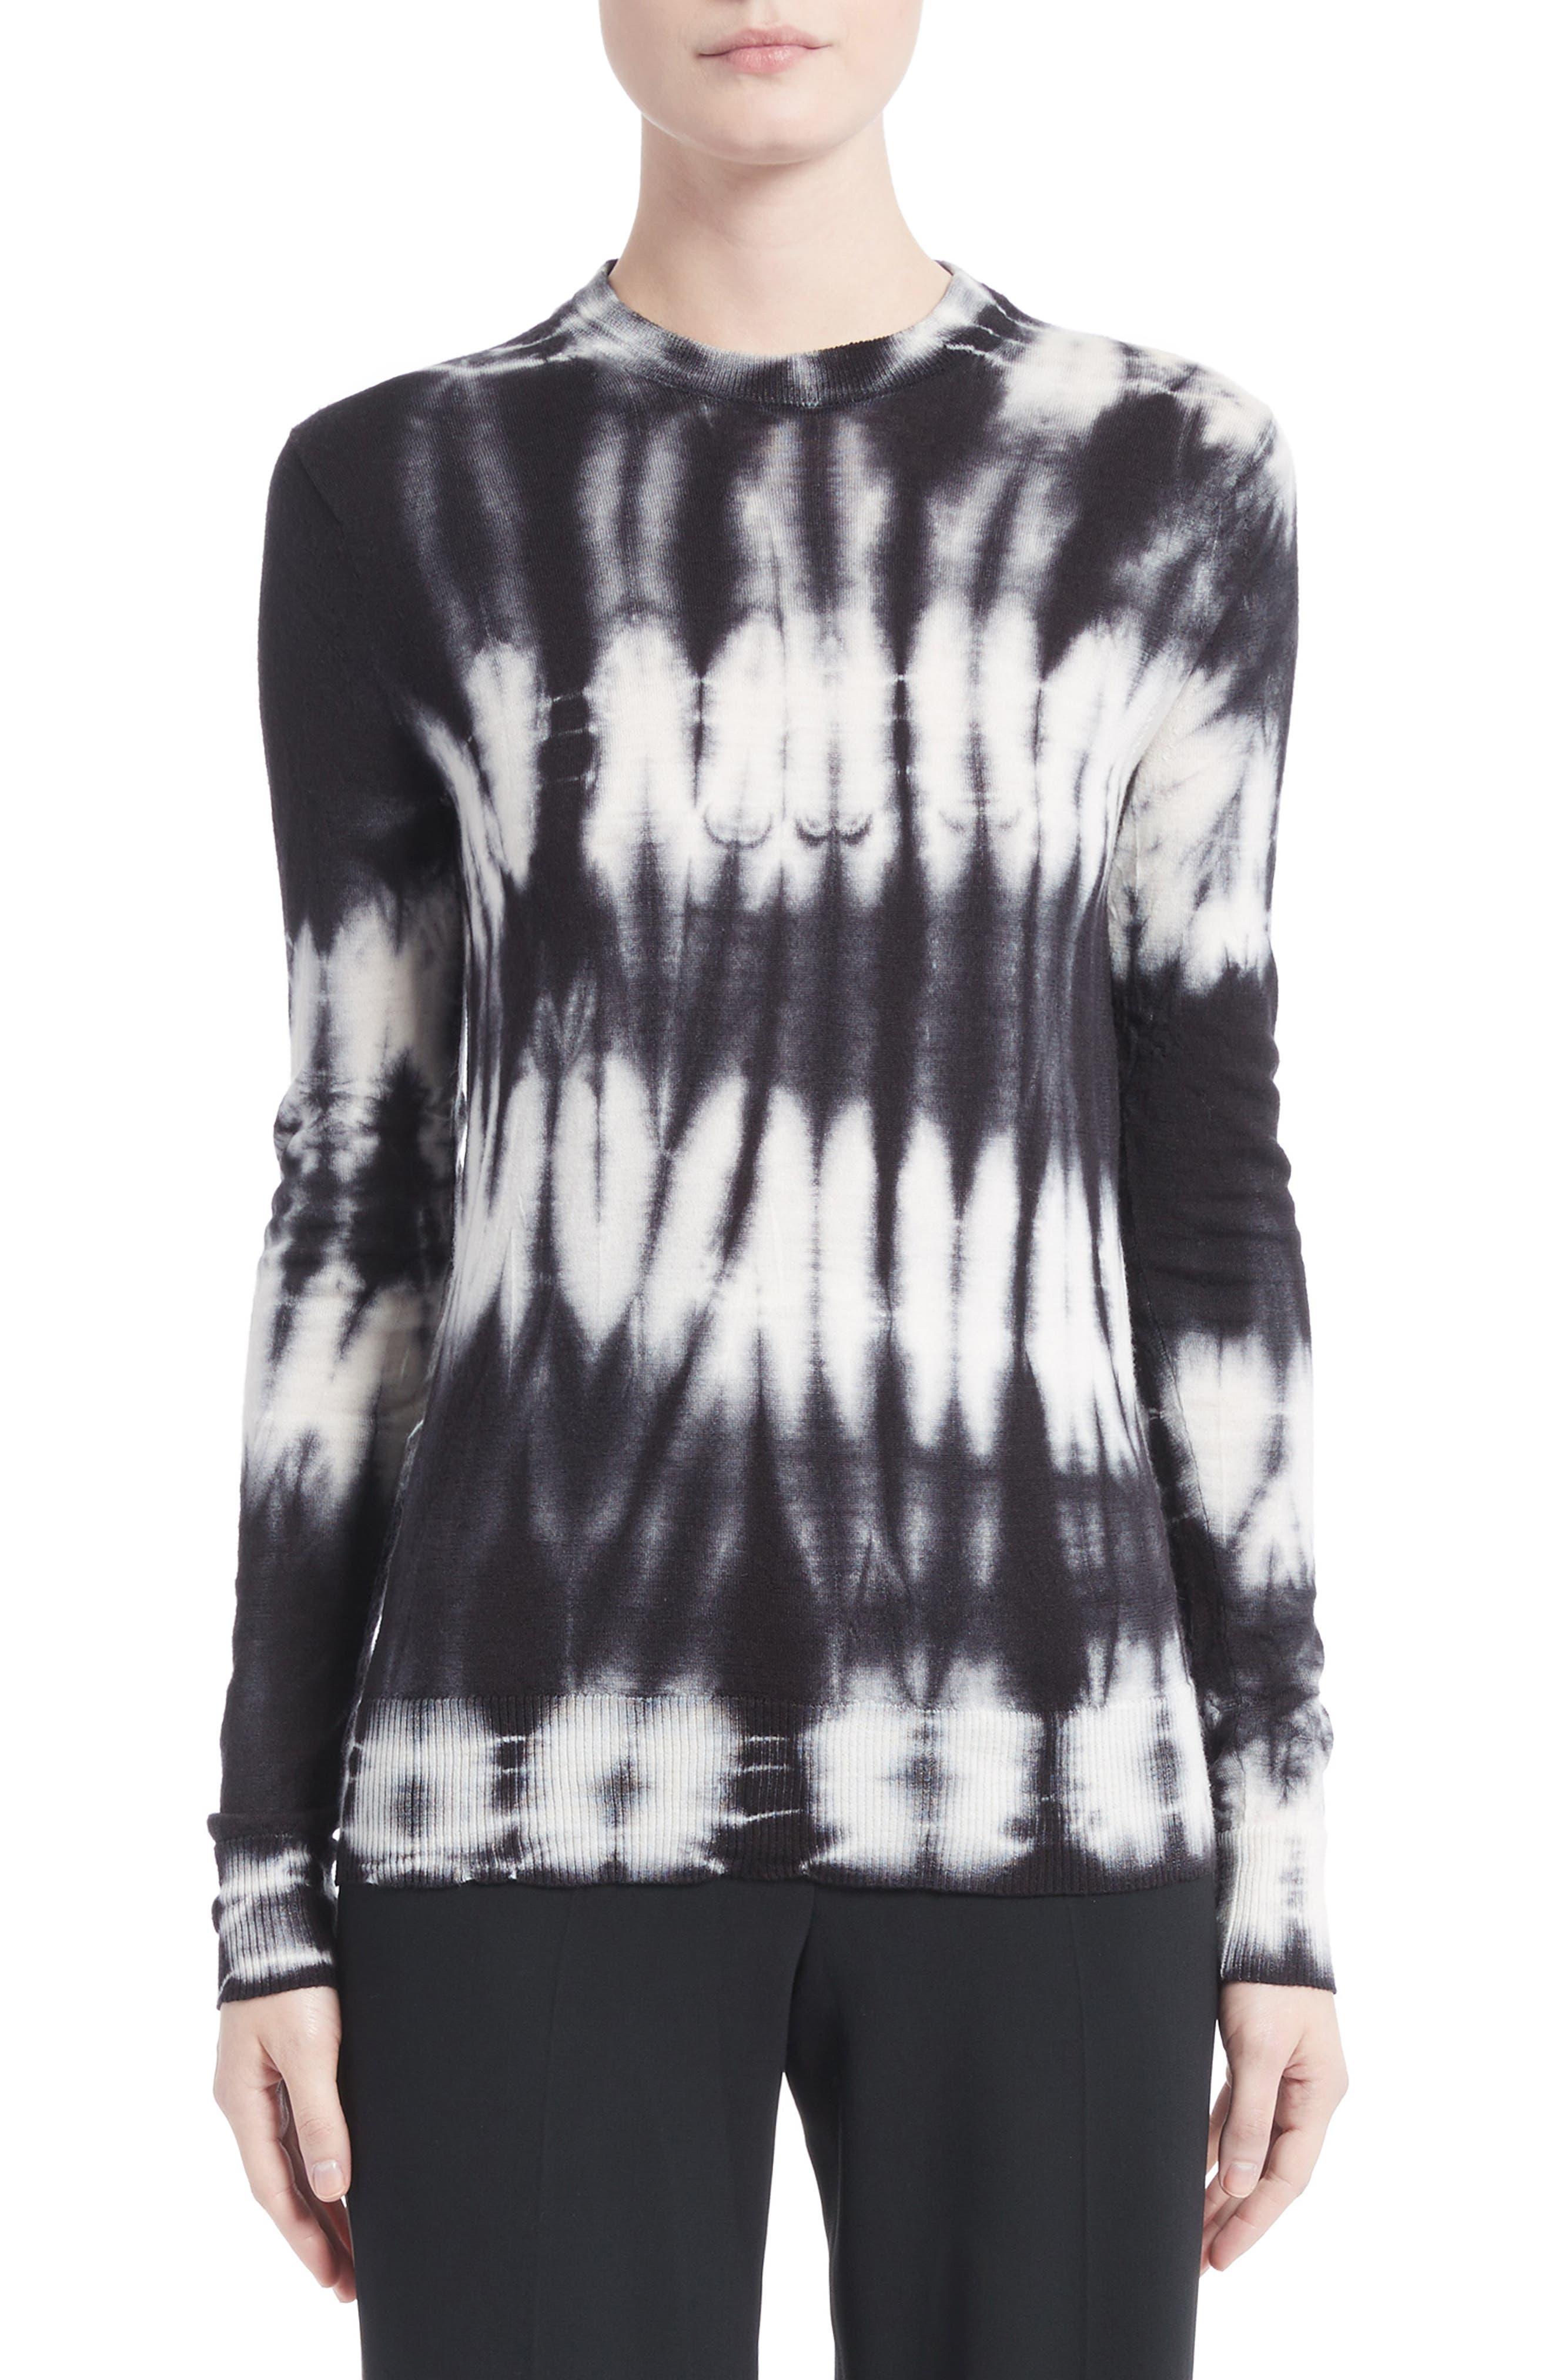 Tie Dye Wool Sweater,                             Main thumbnail 1, color,                             Black/ White